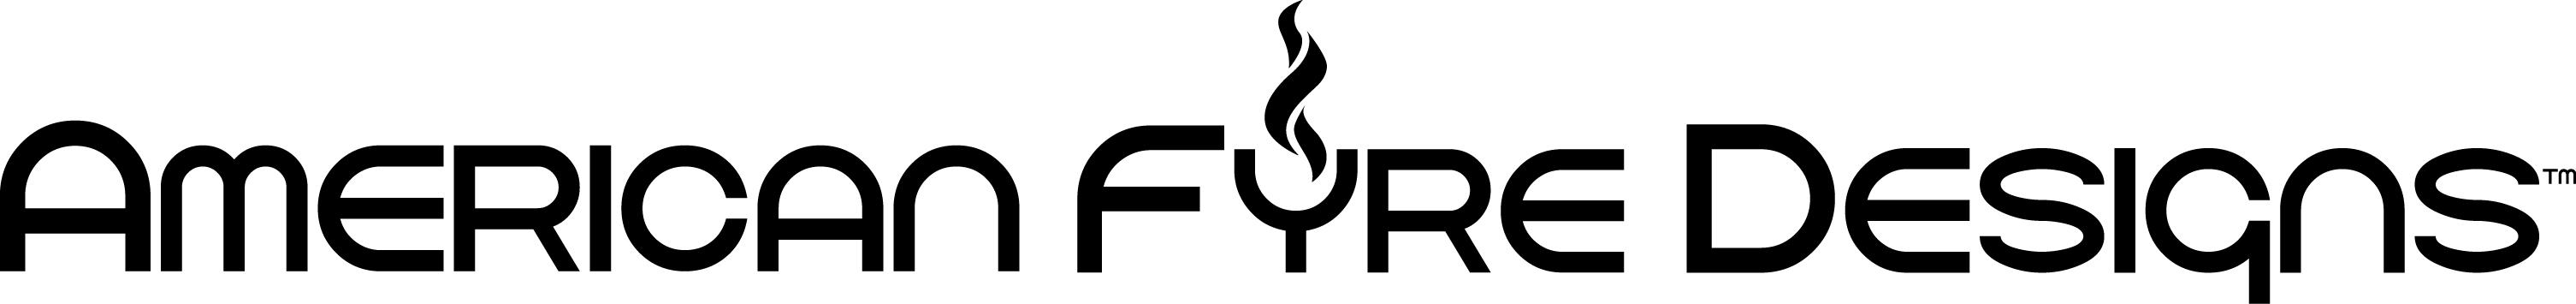 afd-logo-blk-wo-rhpprint.jpg